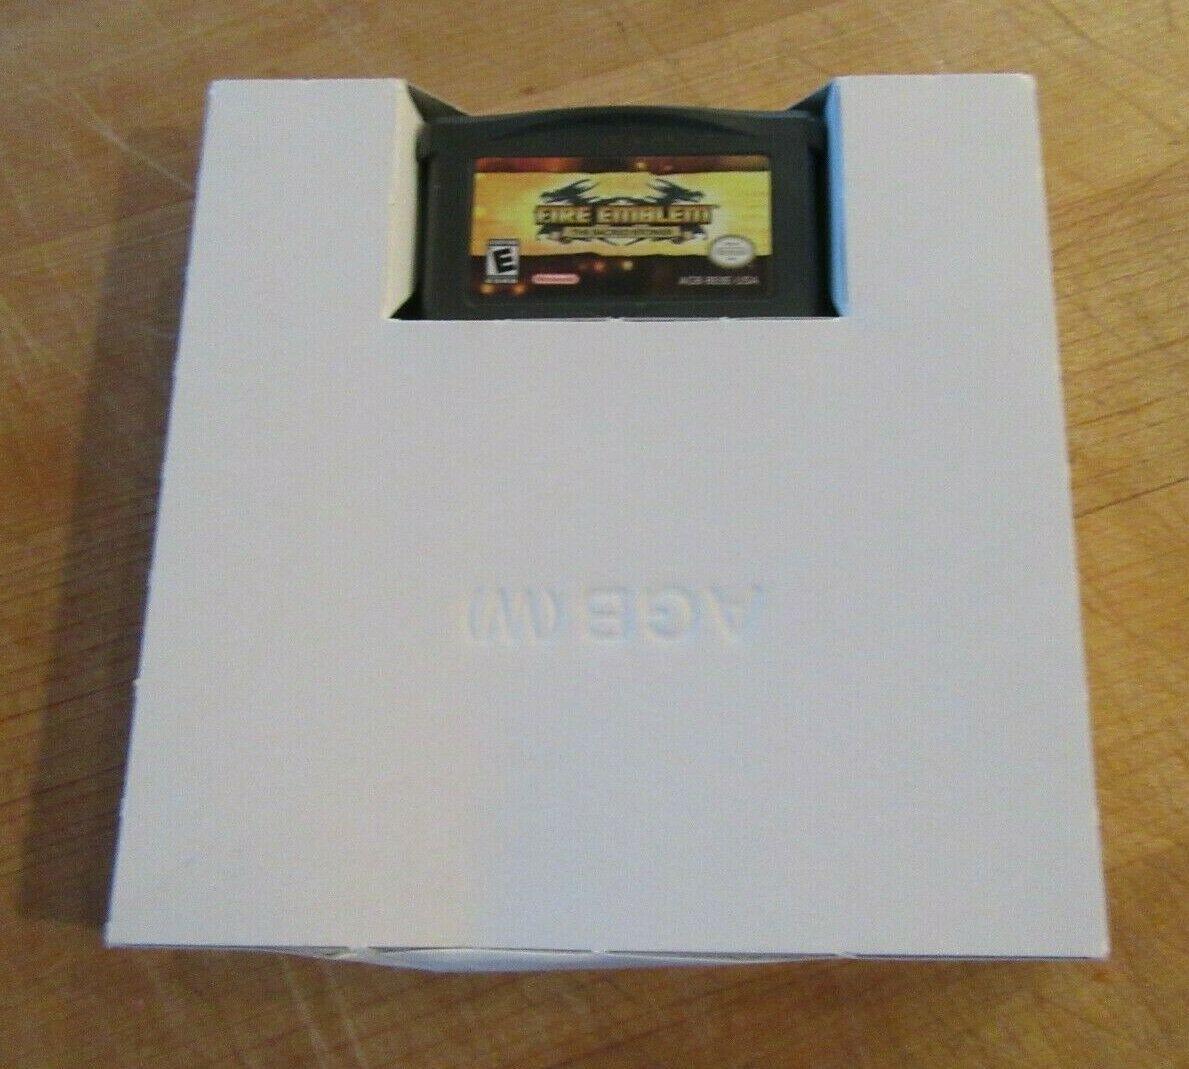 Fire Emblem: The Sacred Stones (Nintendo Game Boy Advance, 2005) image 4